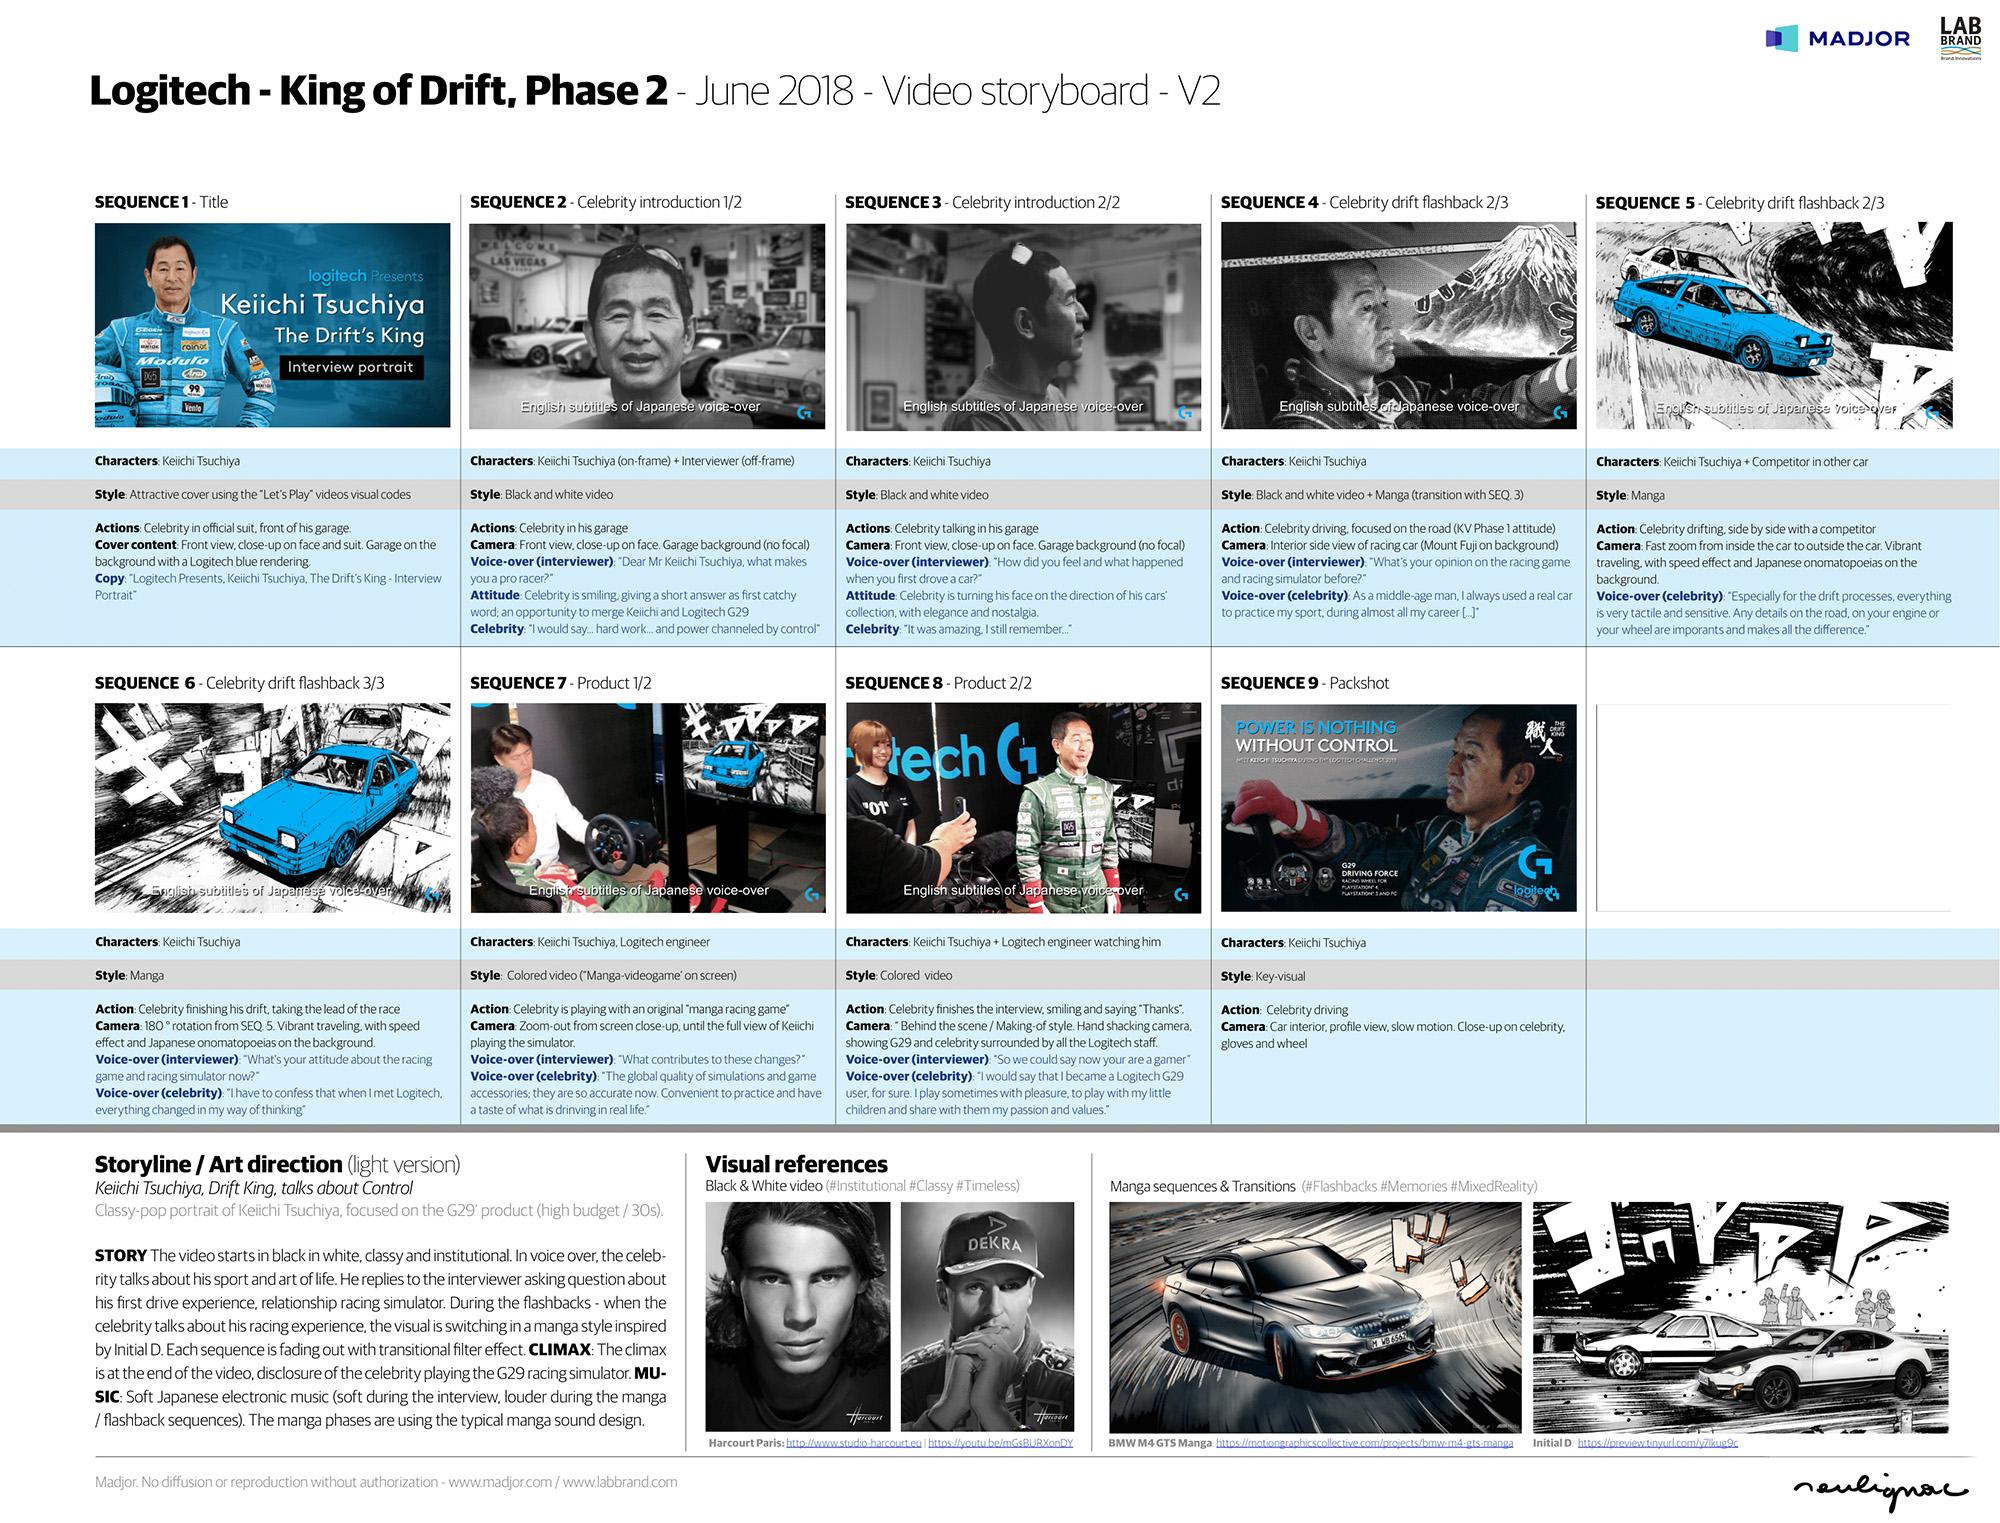 Logitech China - Global Campaign Keiichi Tsuchiya - The Drift King - STORYBOARD - Francois Soulignac - Digital Creative & Art Direction - MADJOR Labbrand Shanghai, China